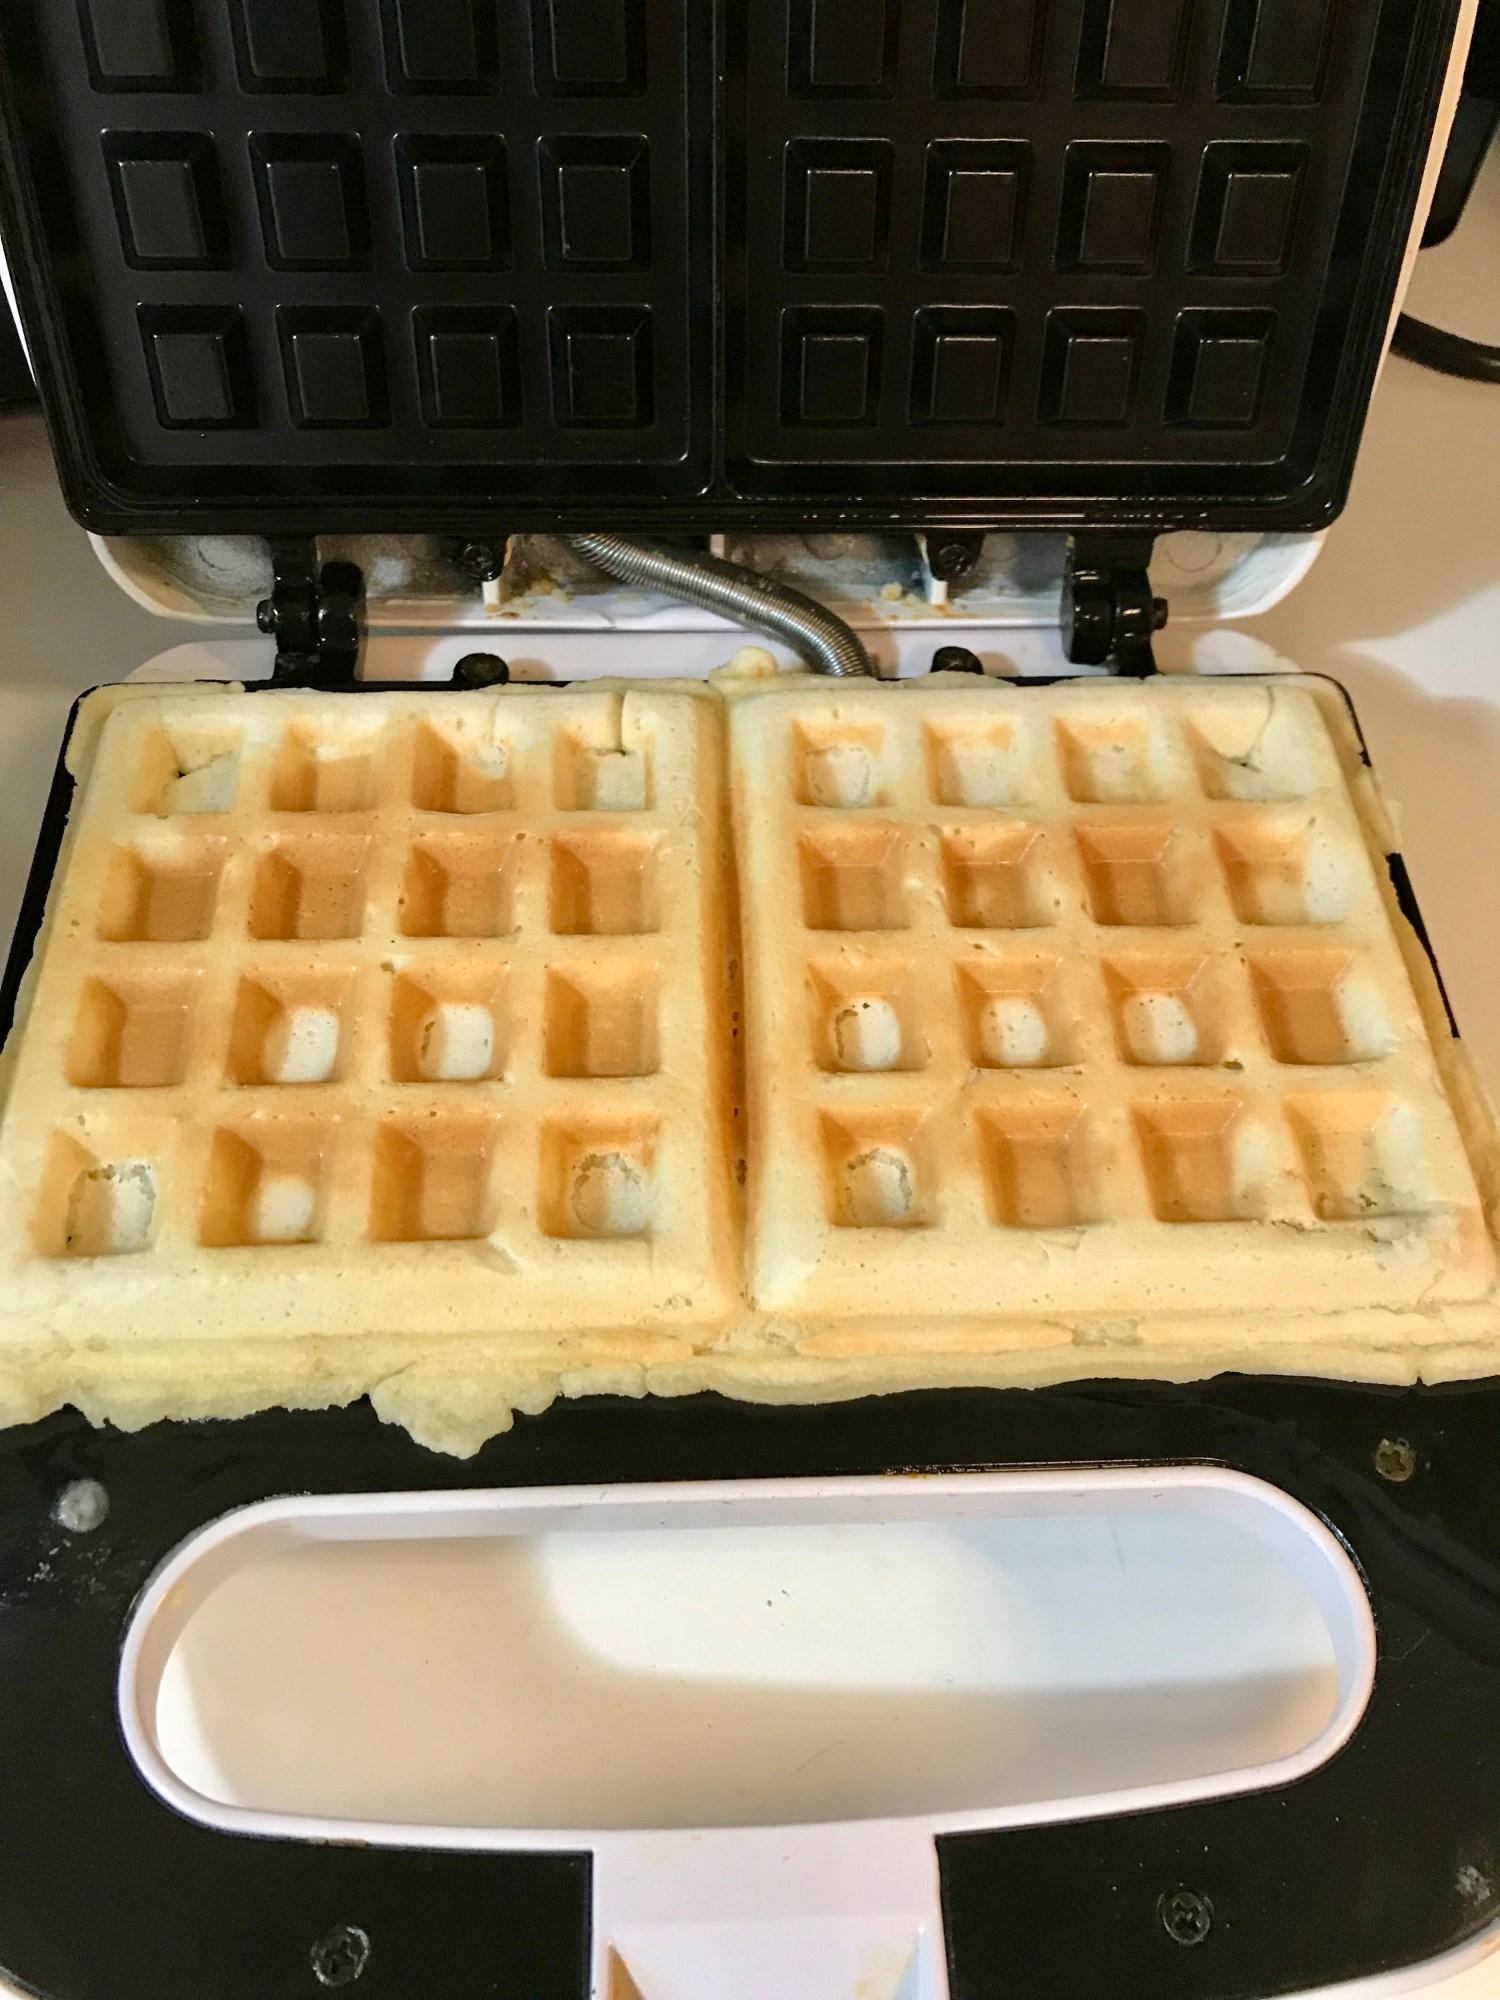 Waffles on waffle maker